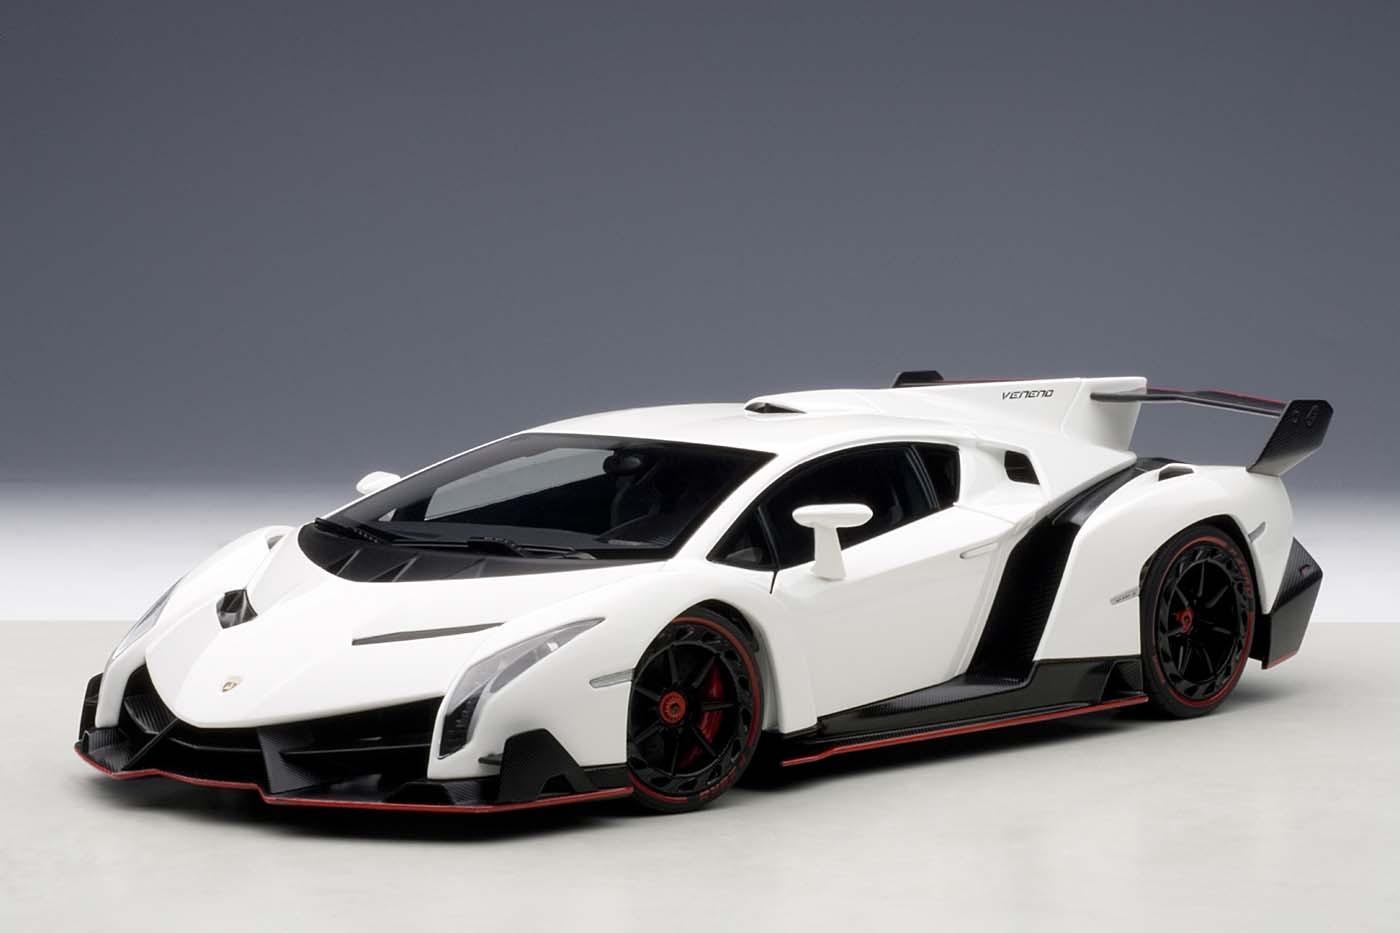 Autoart Highly Detailed Die Cast Model White Lamborghini